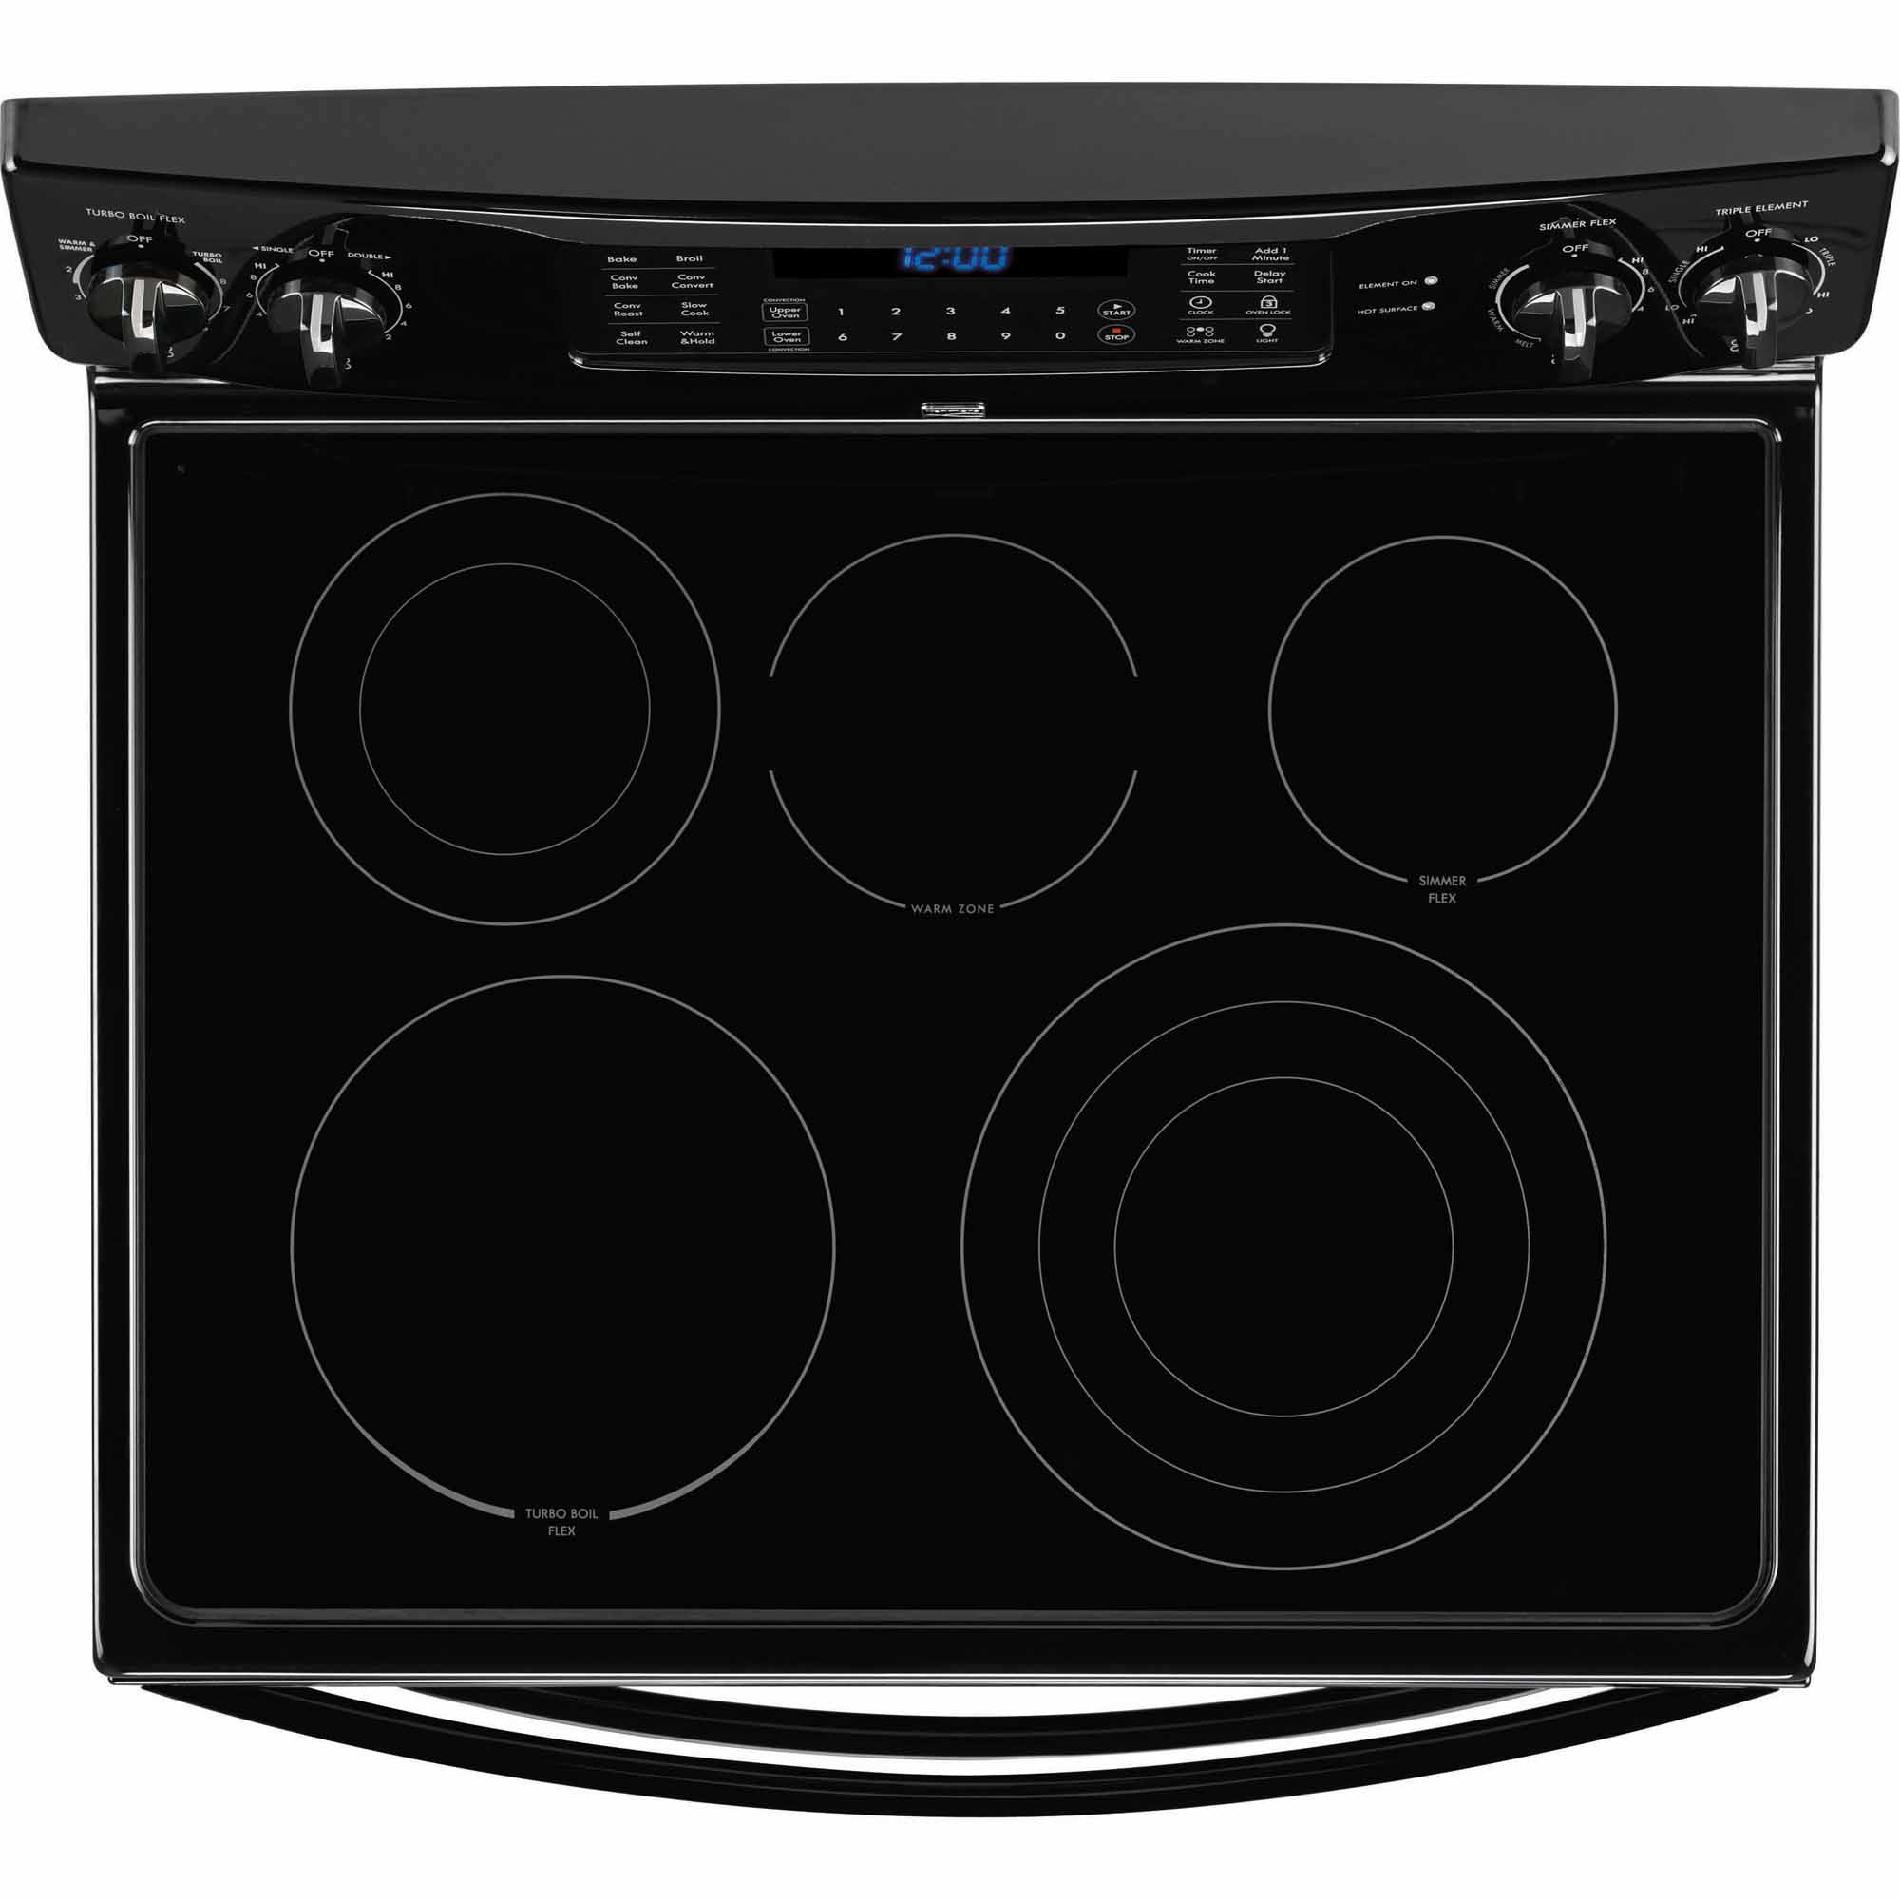 Kenmore Elite 97319 6.9 cu. ft. Double-Oven Electric Range w/ True Convection - Black